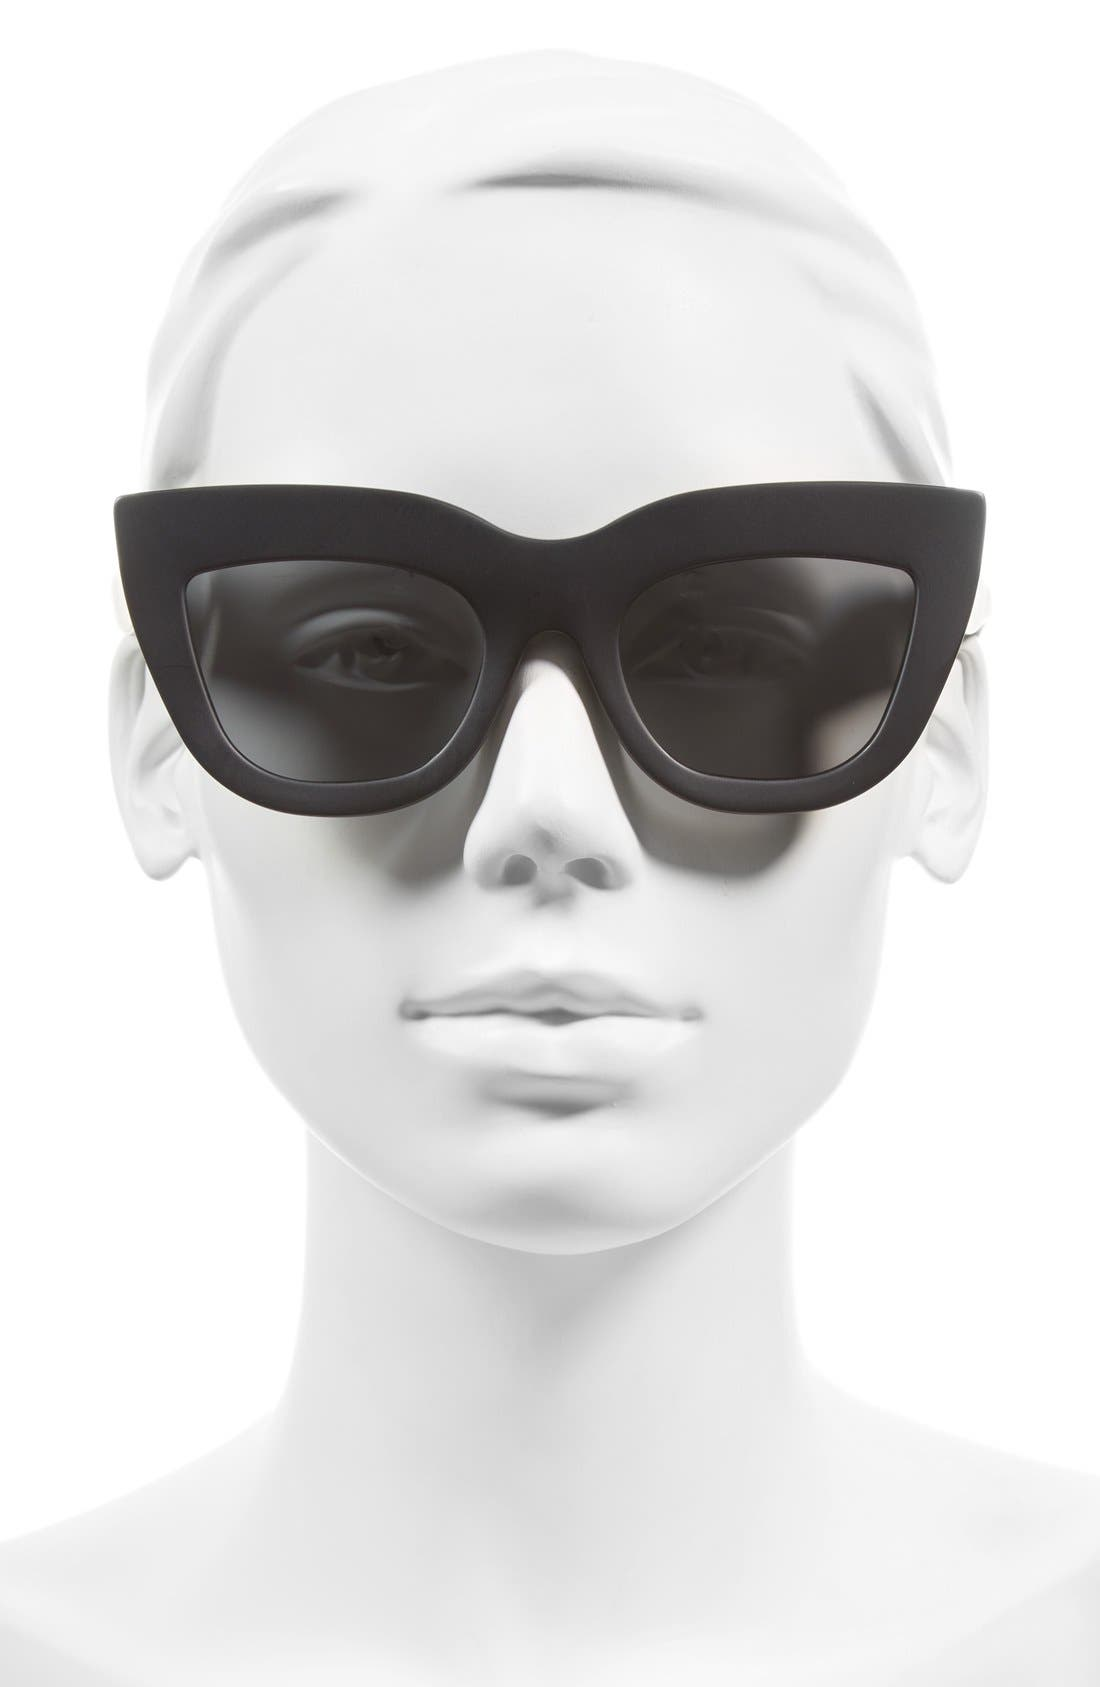 Marmont 52mm Cat Eye Sunglasses,                             Alternate thumbnail 2, color,                             Matte Black